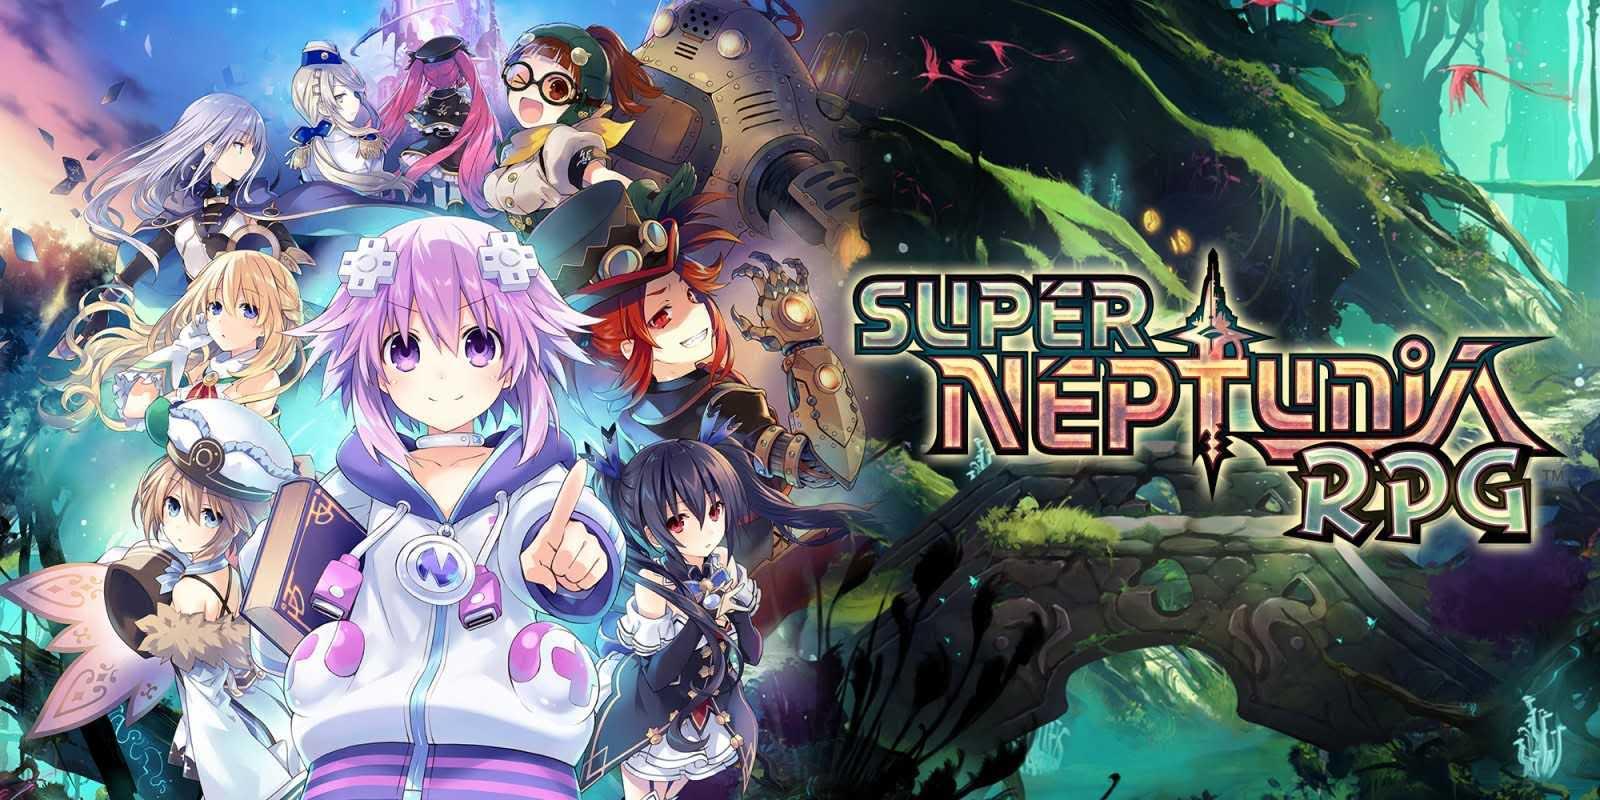 super-neptunia-rpg-deluxe-edition